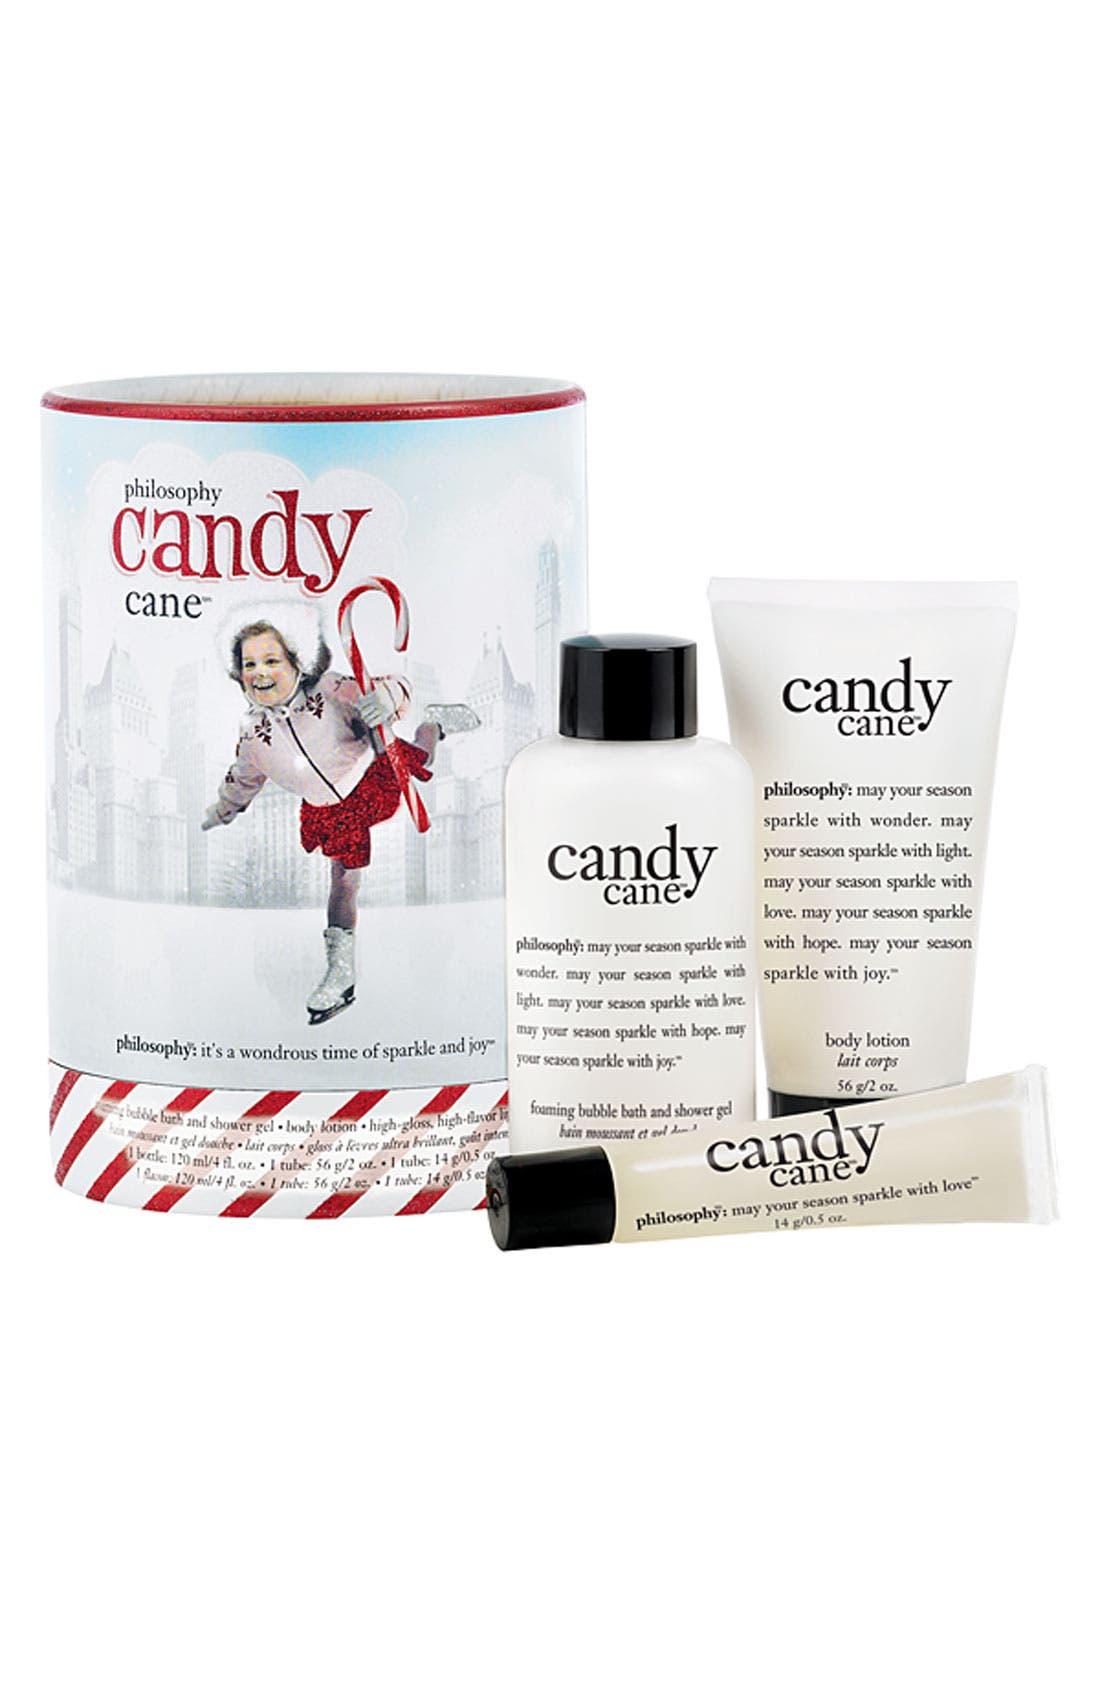 Alternate Image 1 Selected - philosophy 'candy cane' gift set